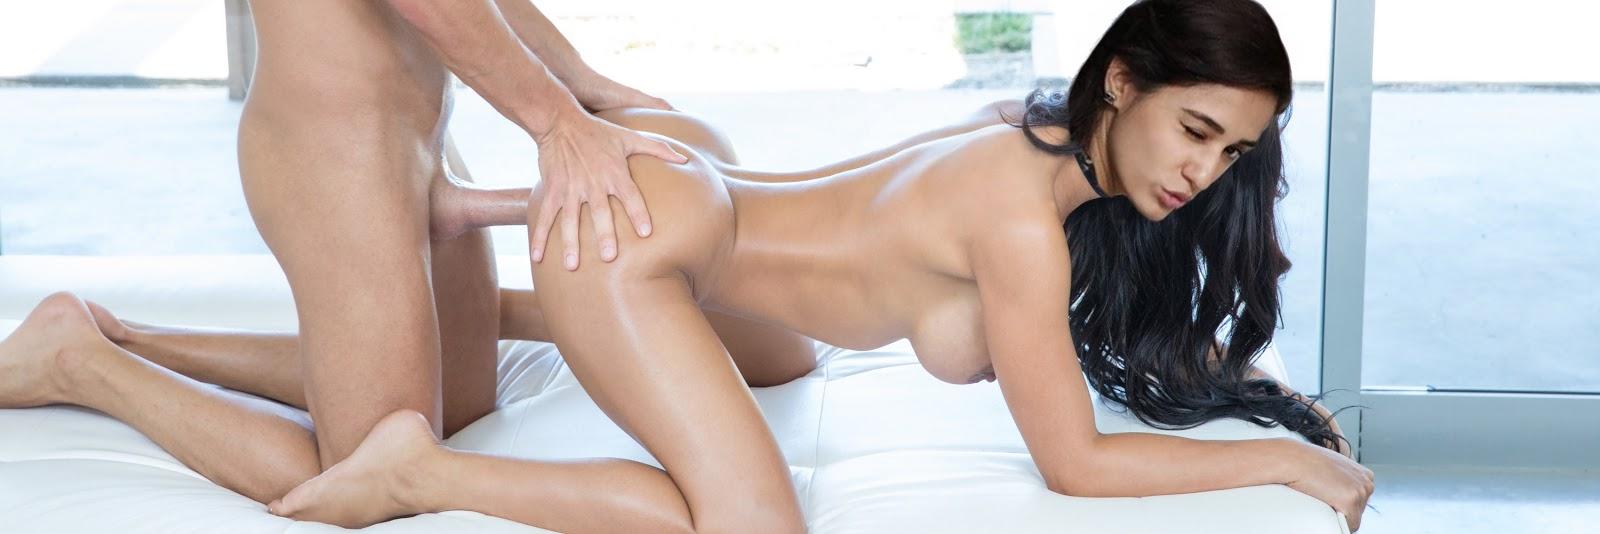 DishaPataniPussyFuckedinDoggyStyle - Disha Patani Nude Boobs XXX Pussy Sex Photos